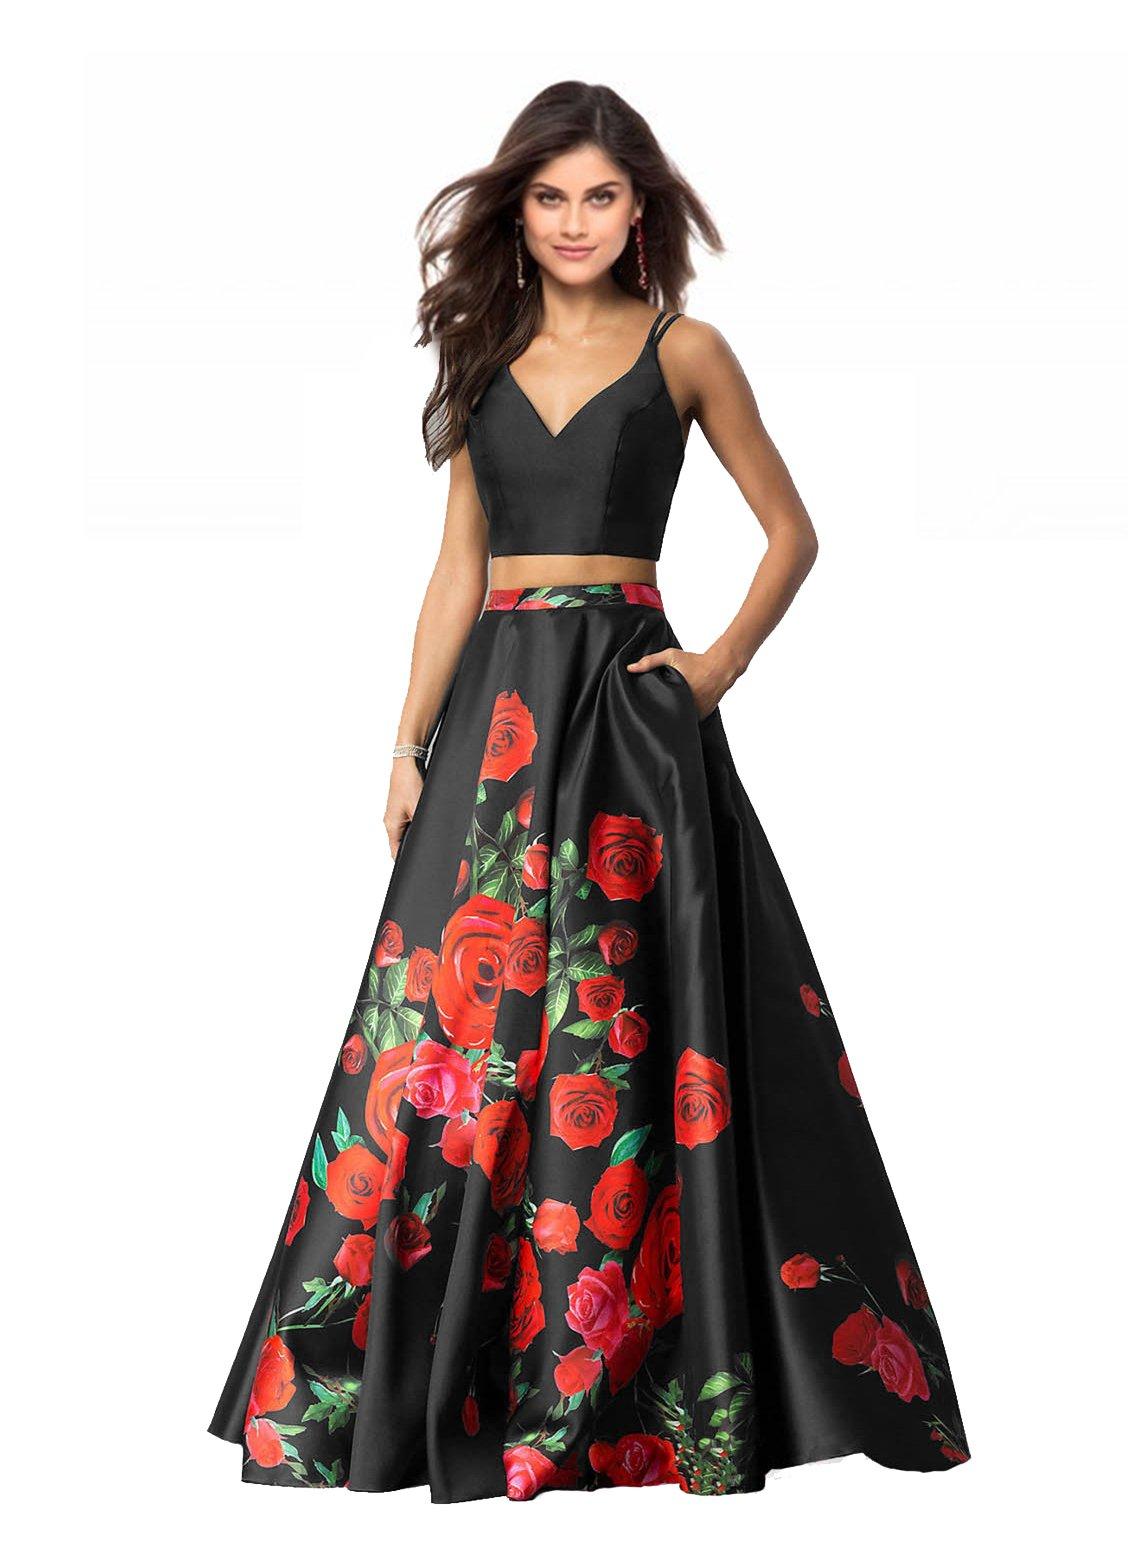 78c185ce9d 2 Piece Prom Dresses Black